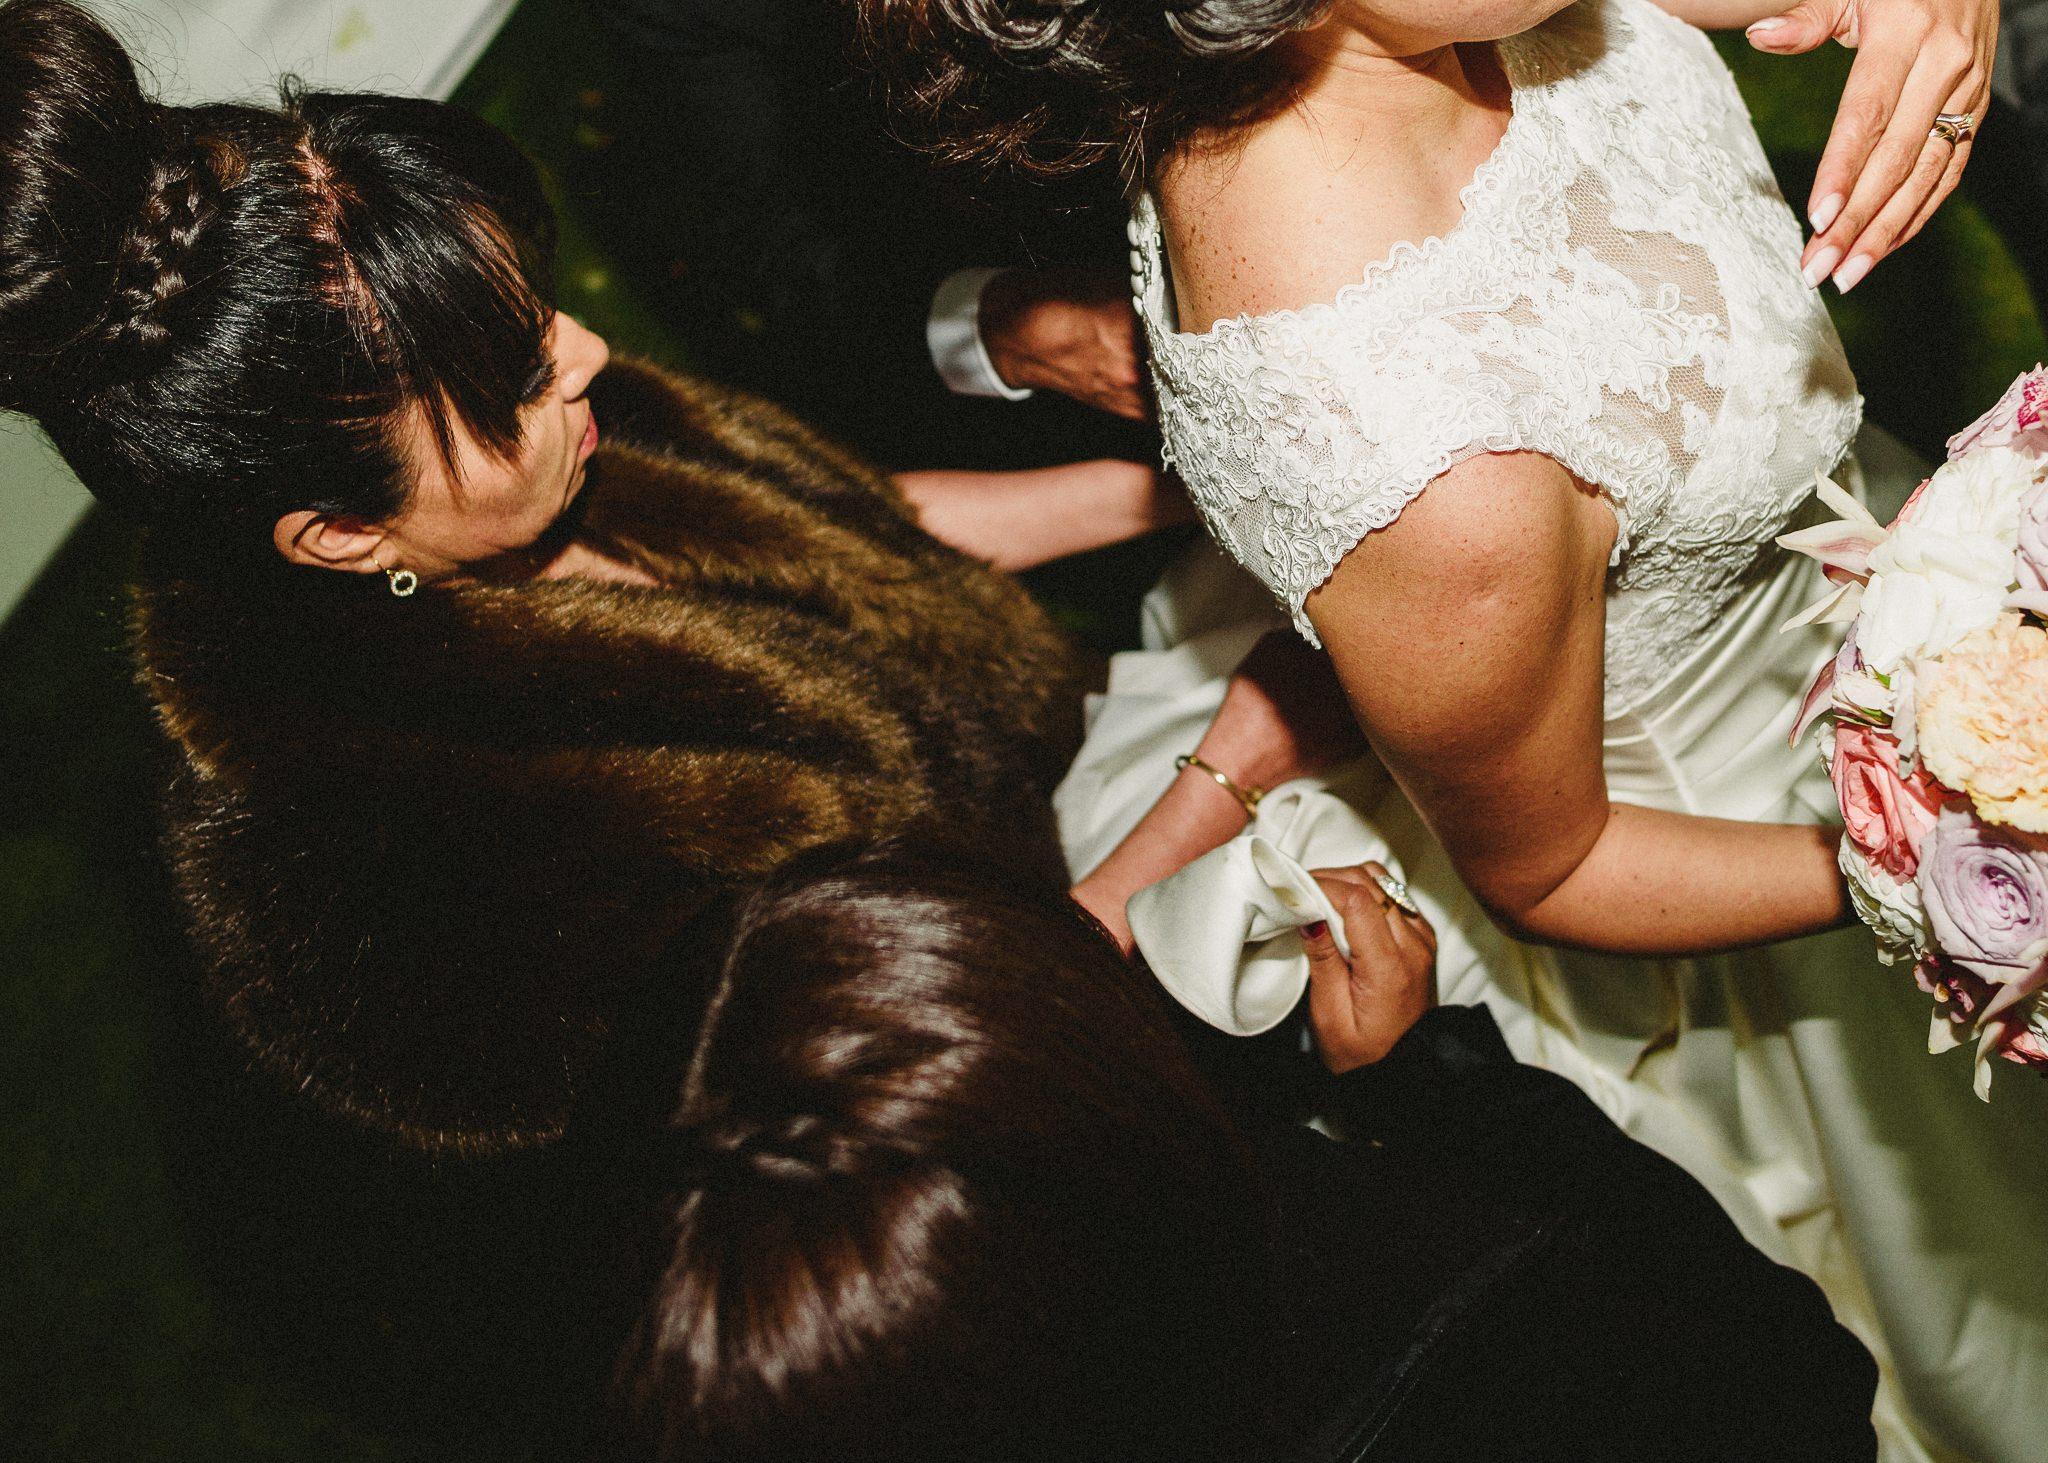 Wedding-Boda-Tulancingo-Hidalgo-Salon-Essenzia-Luis-Houdin-44-film